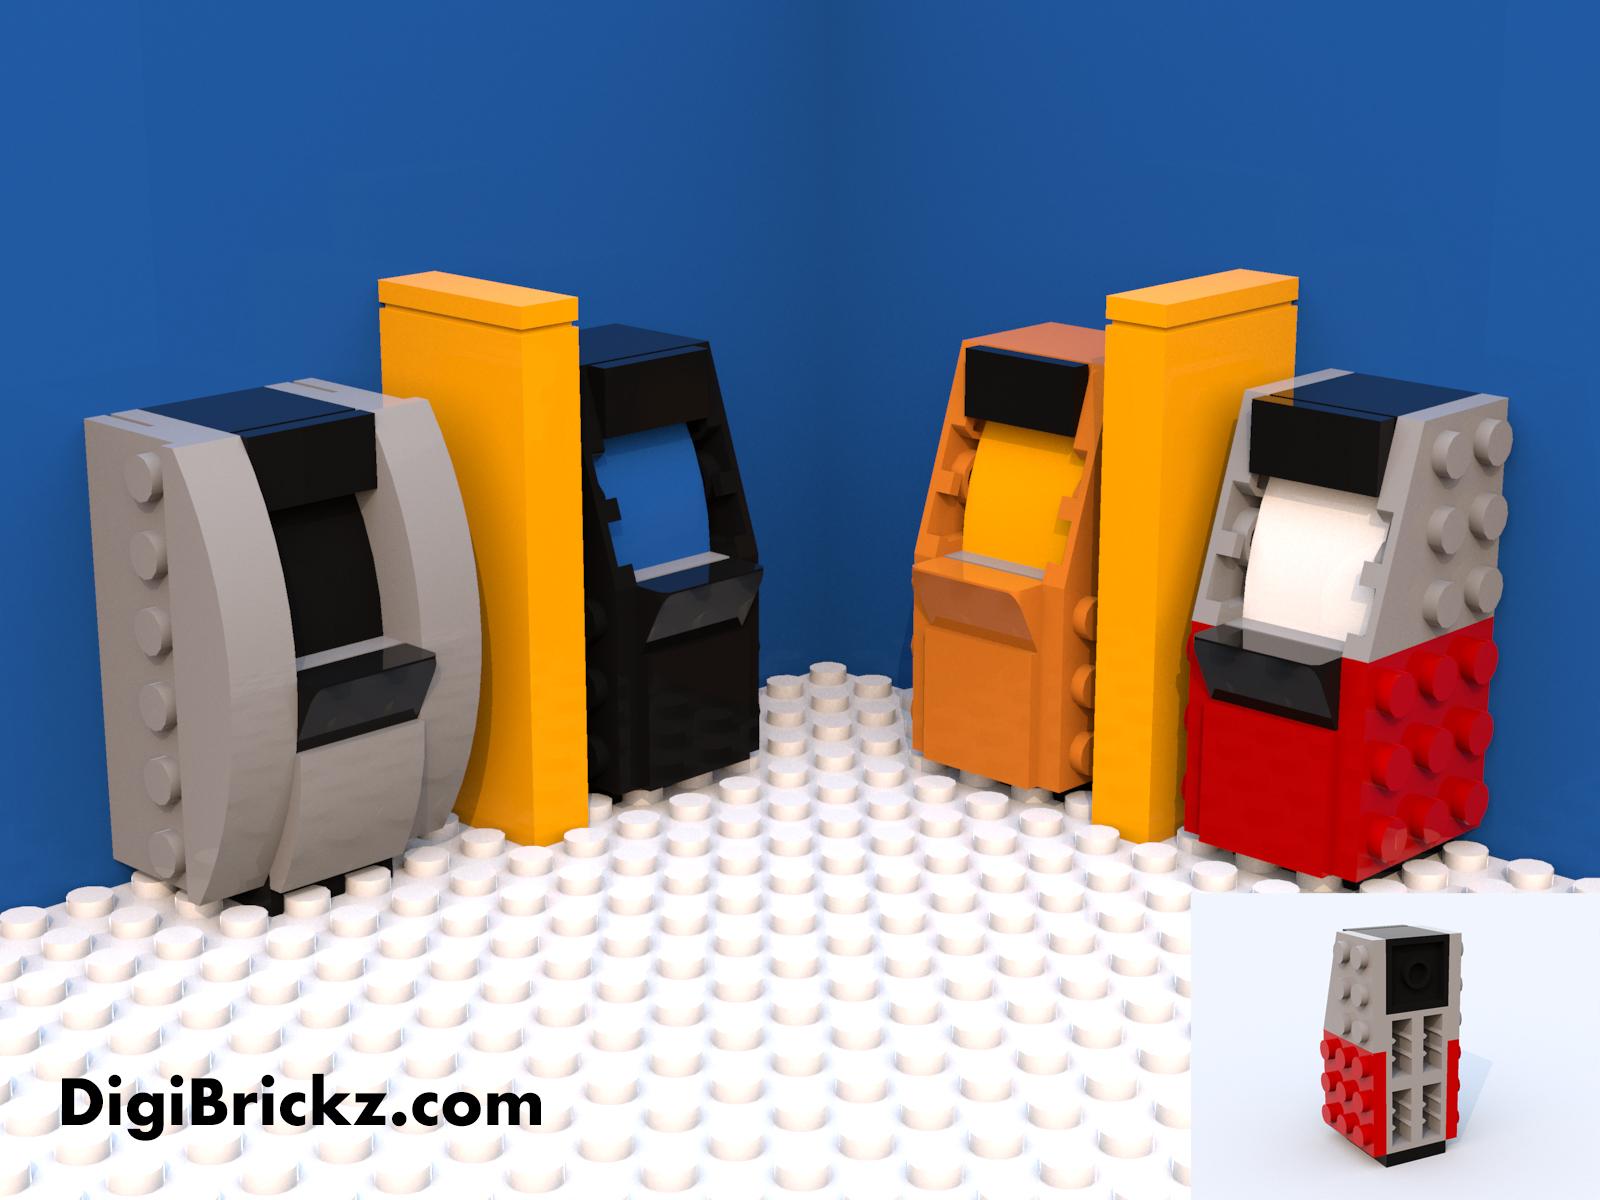 LEGO ATM Gallery by Kamal Muftie Yafi (KamalMYafi/Kamteey) | DigiBrickz.com